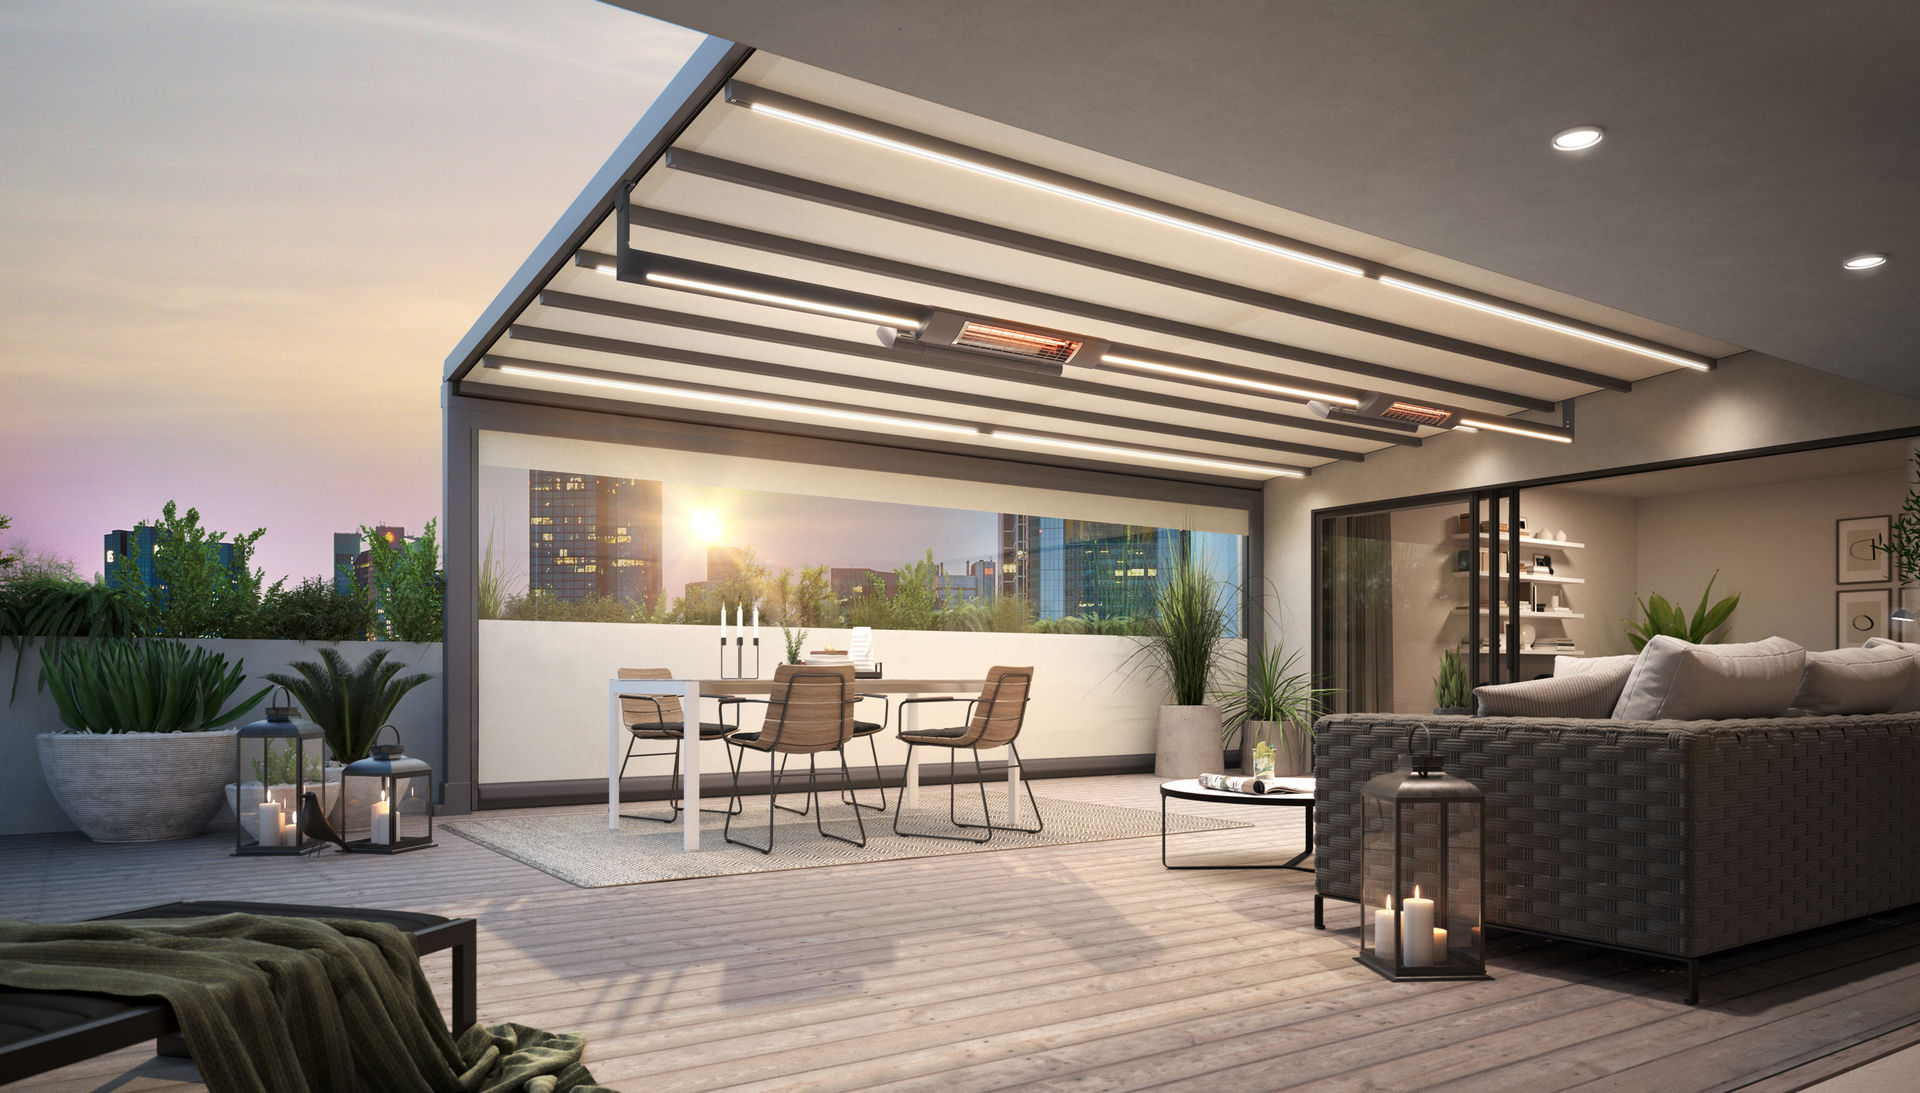 761768_pergola stretch Penthouse Detail Vertikalmarkise Panoramafenster 202010_large.jpg